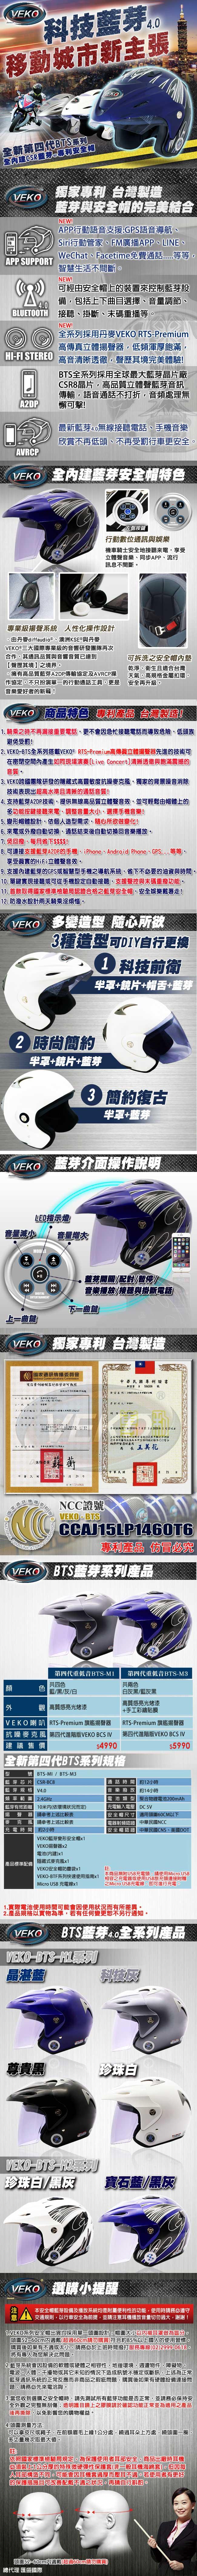 VEKO BTS-M1藍芽4.0立體聲專利安全帽M1 | CrazyMiKE 瘋狂賣客